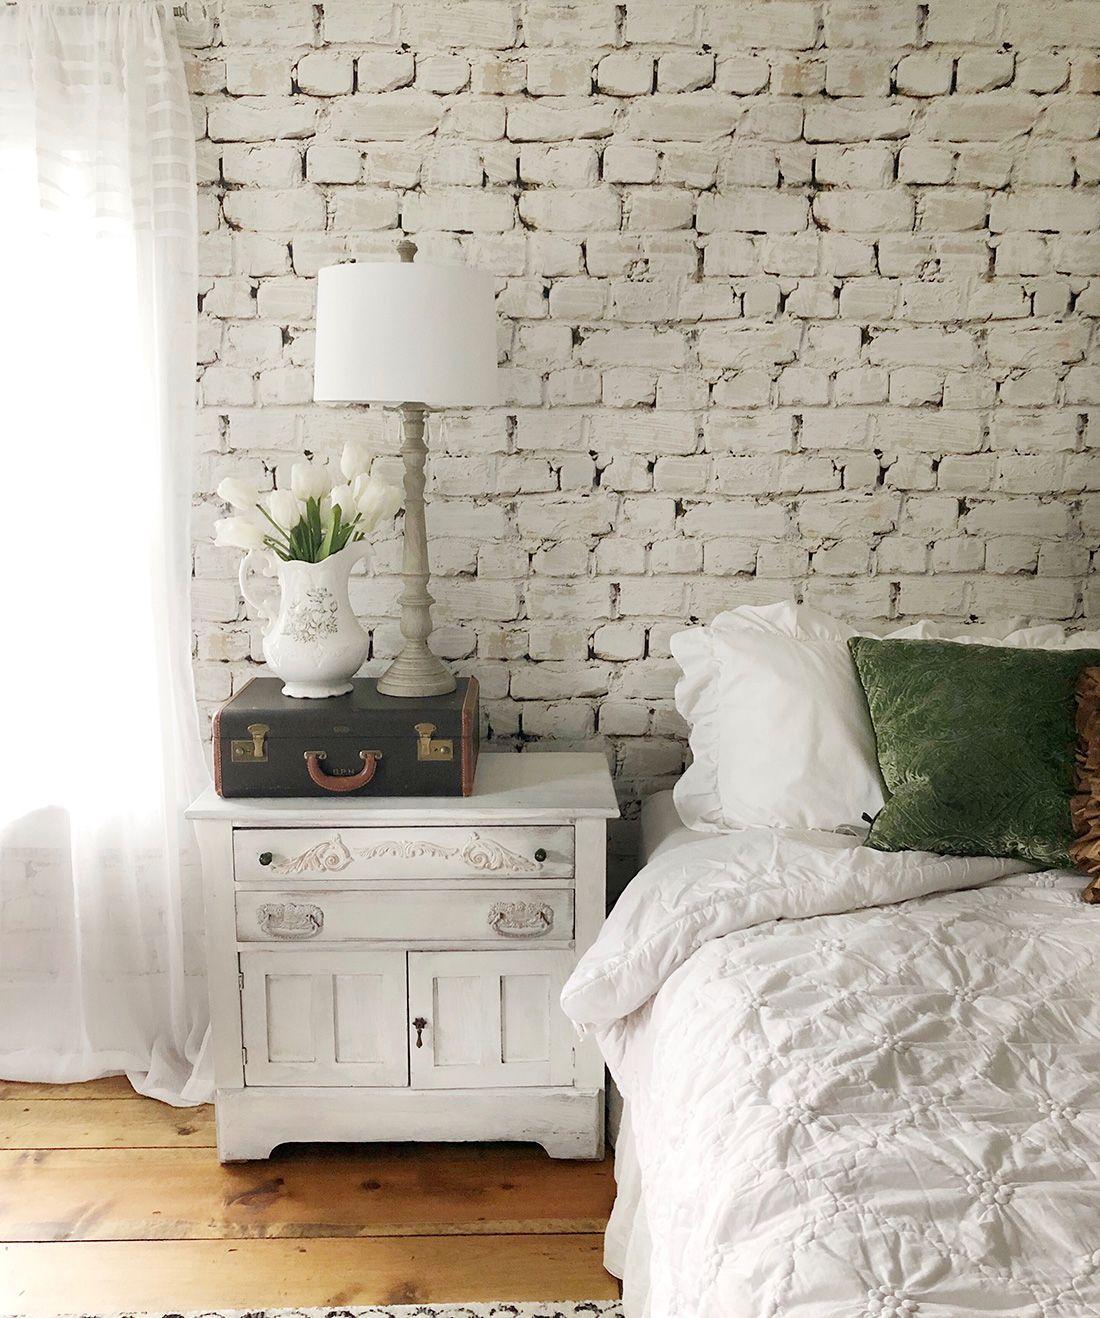 Whitewash Bricks Wallpaper White Rustic Brick Wallpaper Milton King Brick Wall Bedroom White Wash Brick Brick Wallpaper